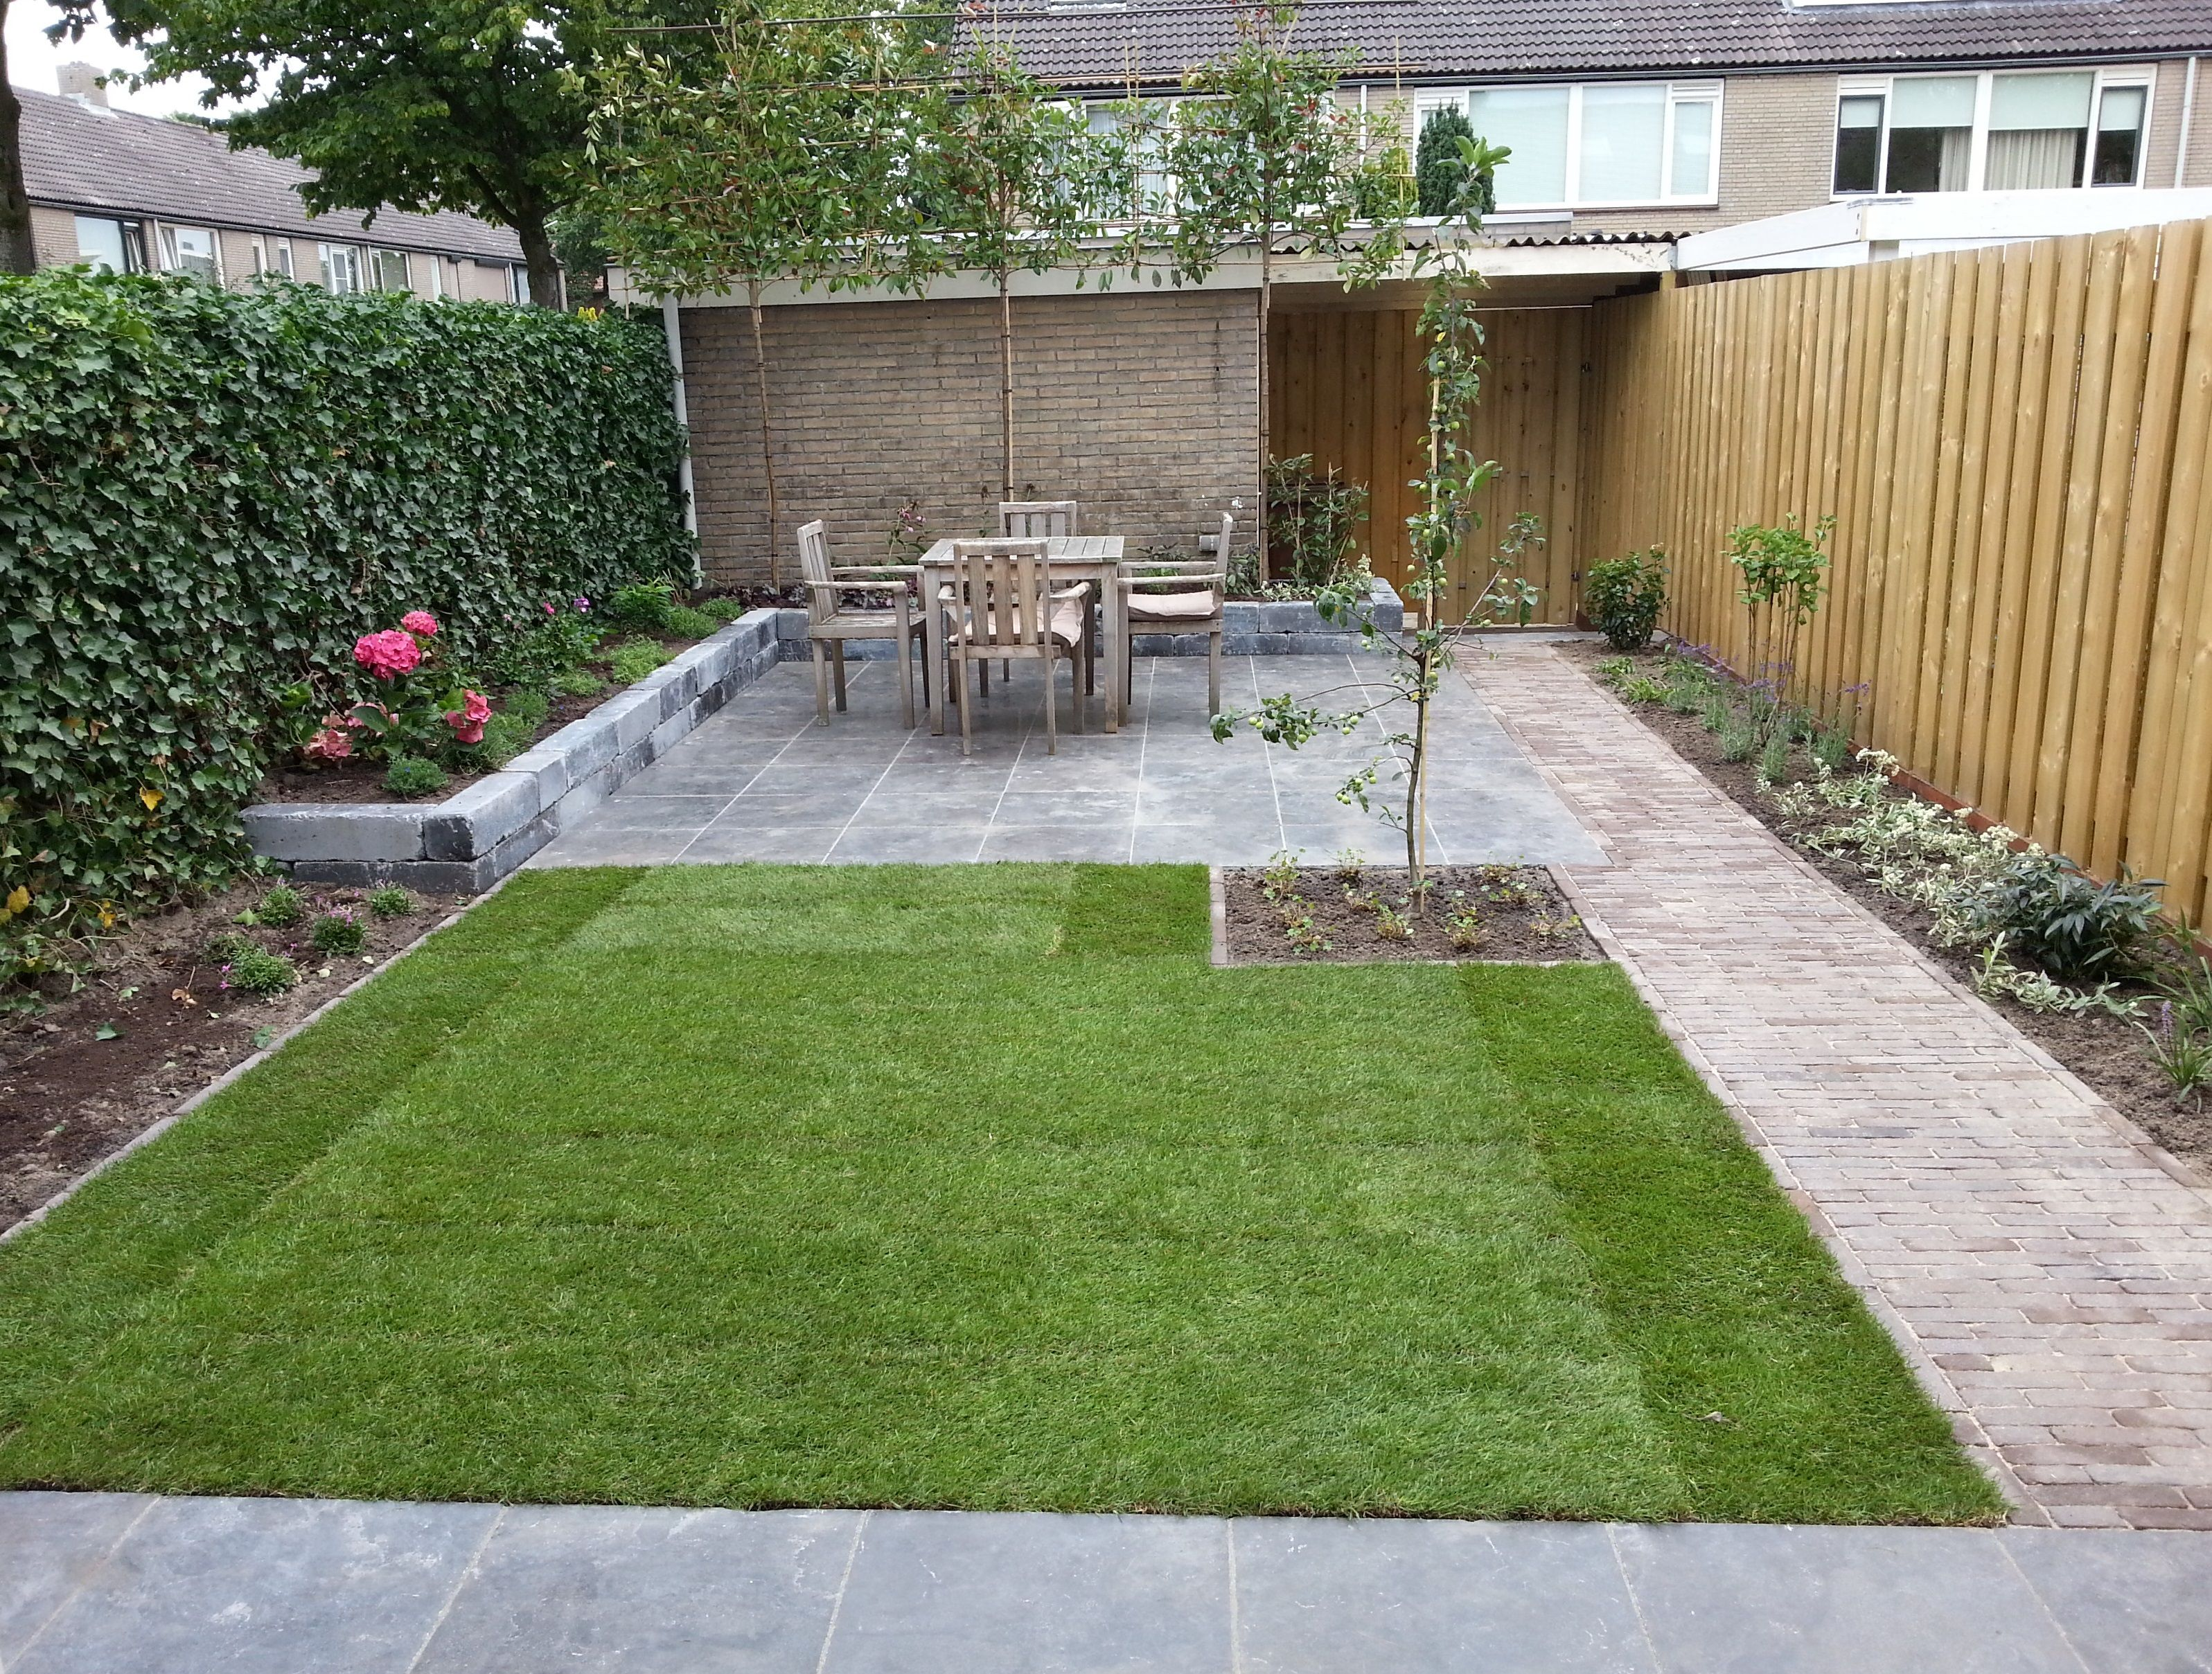 Moderne tuin in breda ontwerp van tuin pinterest moderne tuin ontwerp en tuin - Tuin ontwerp foto ...